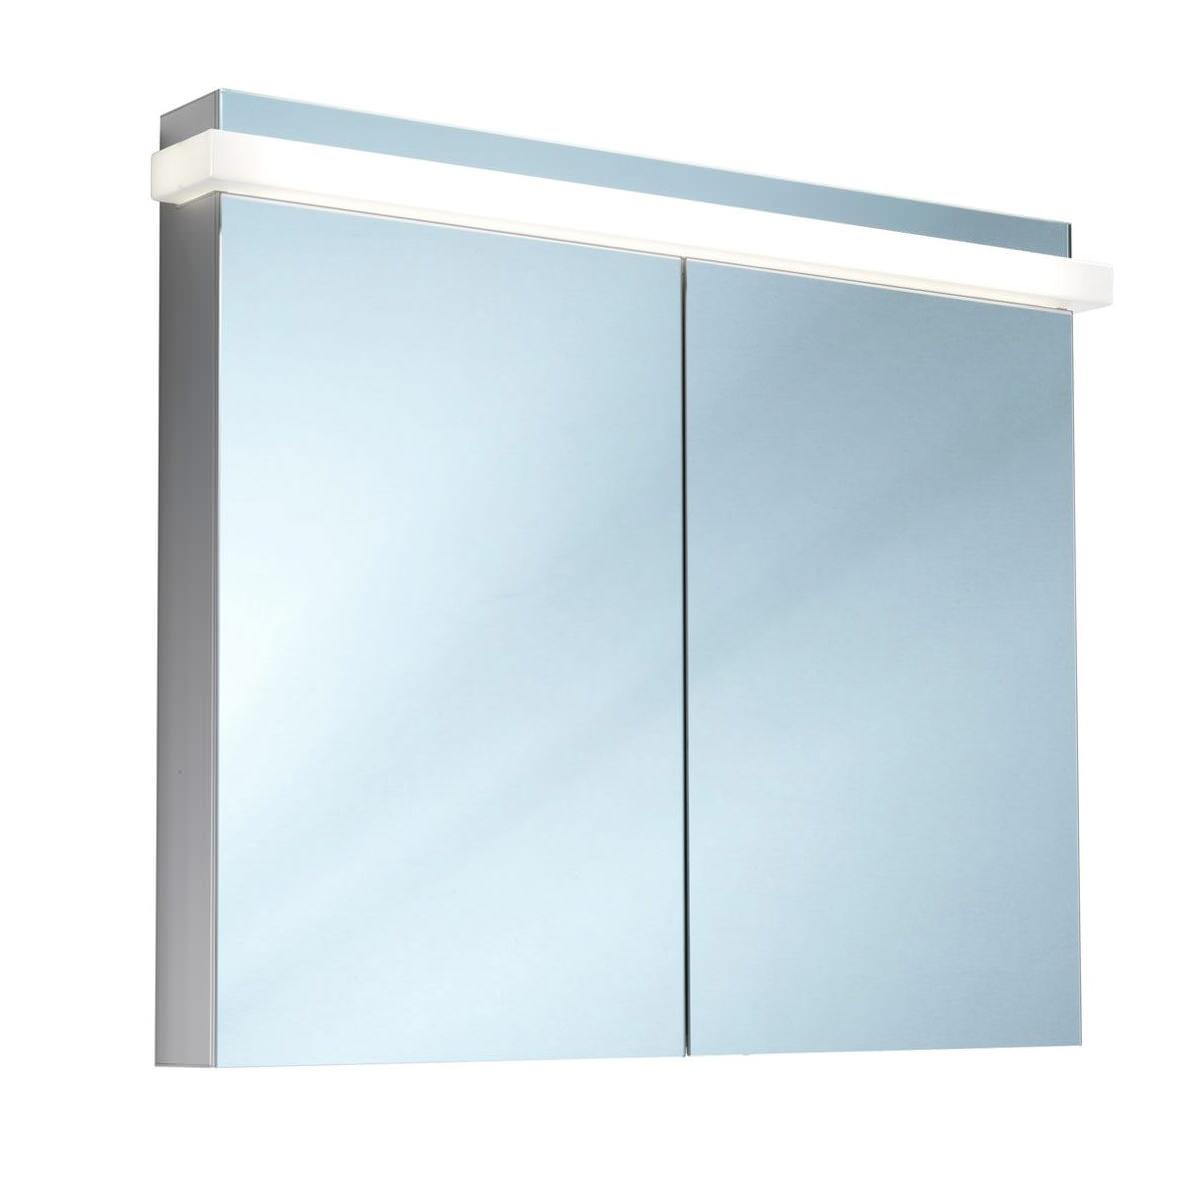 Schneider taikaline 2 door 1000mm mirror cabinet for Bathroom mirror cabinets 900mm and 1000mm